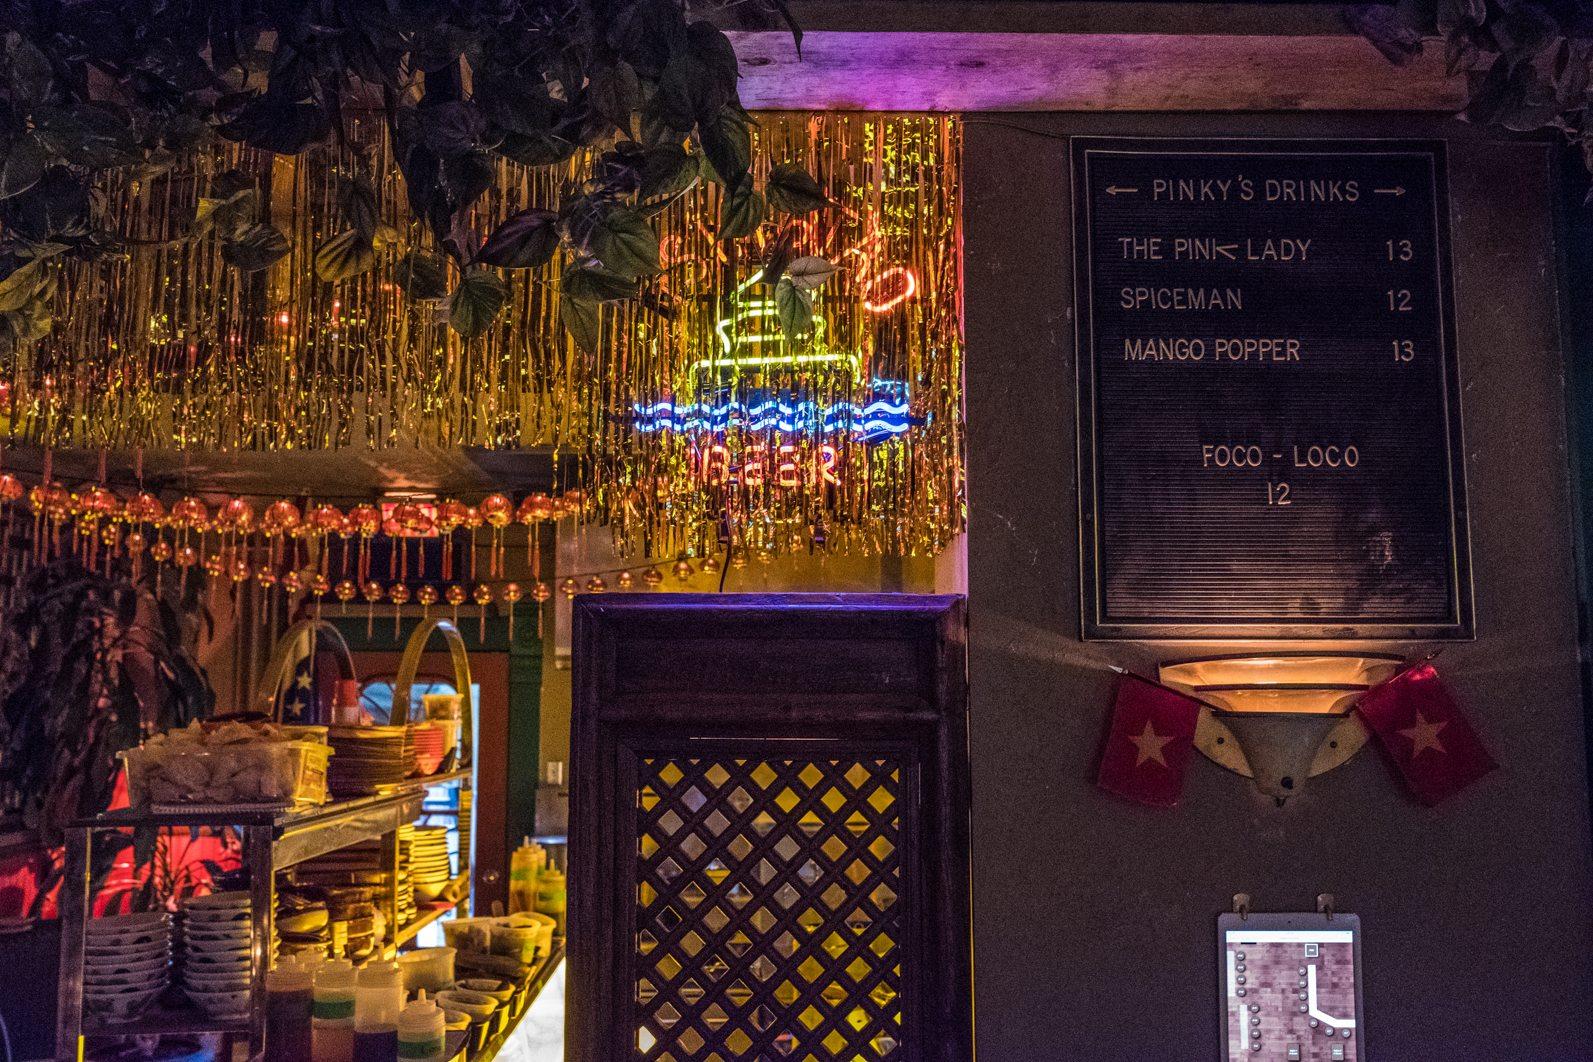 toronto-restaurants-pinkys-ca-phe-vietnamese-cambodian-snack-bar-little-italy-room-7